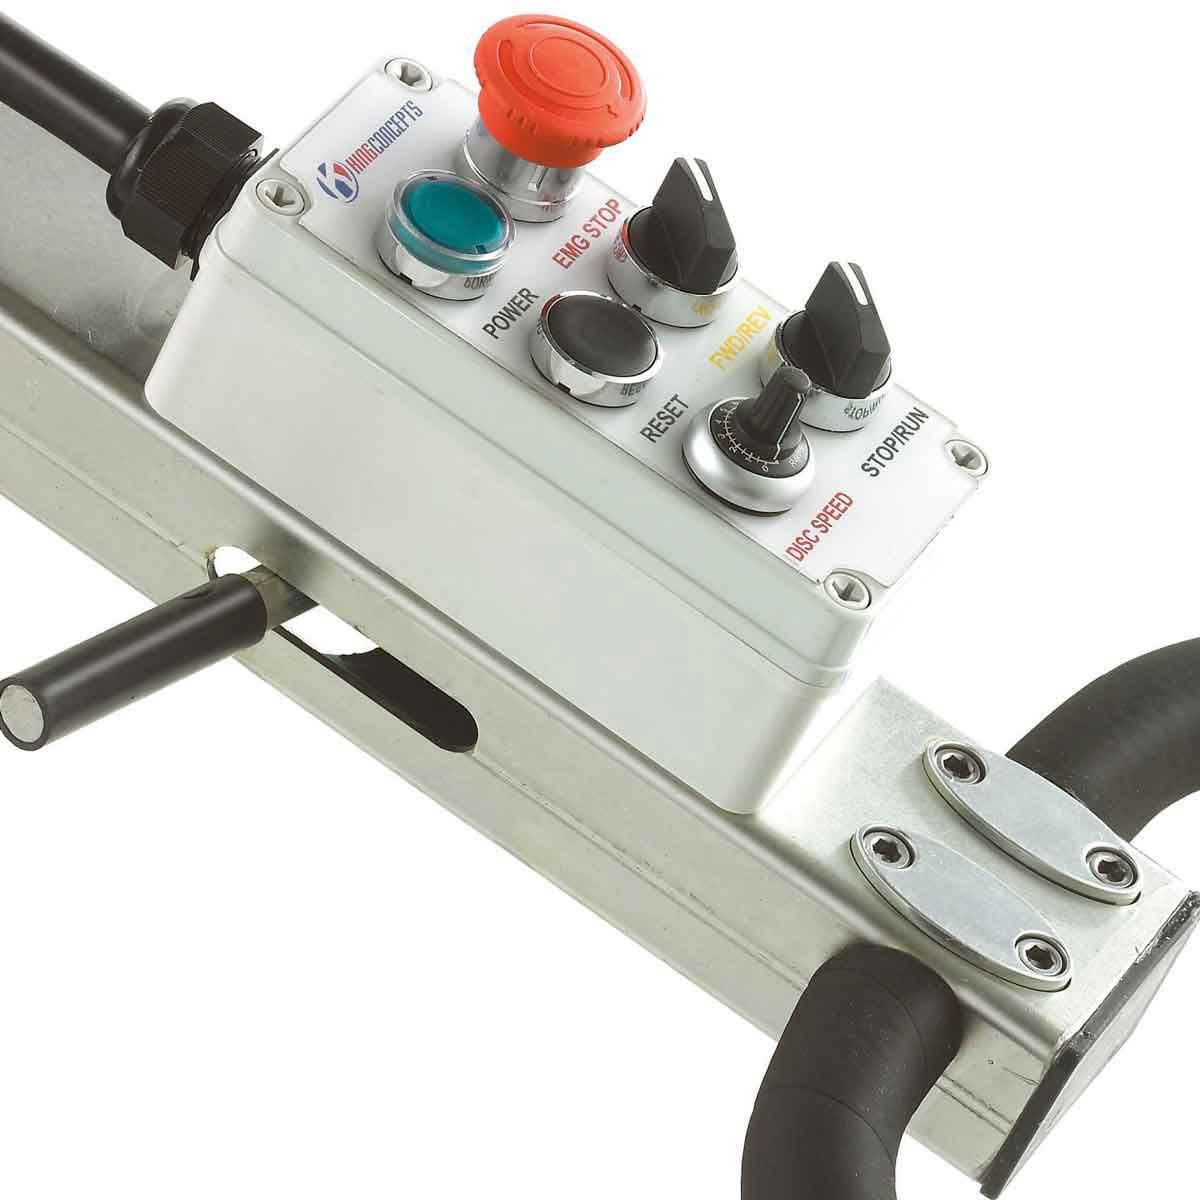 Husqvarna PG 530 Controls